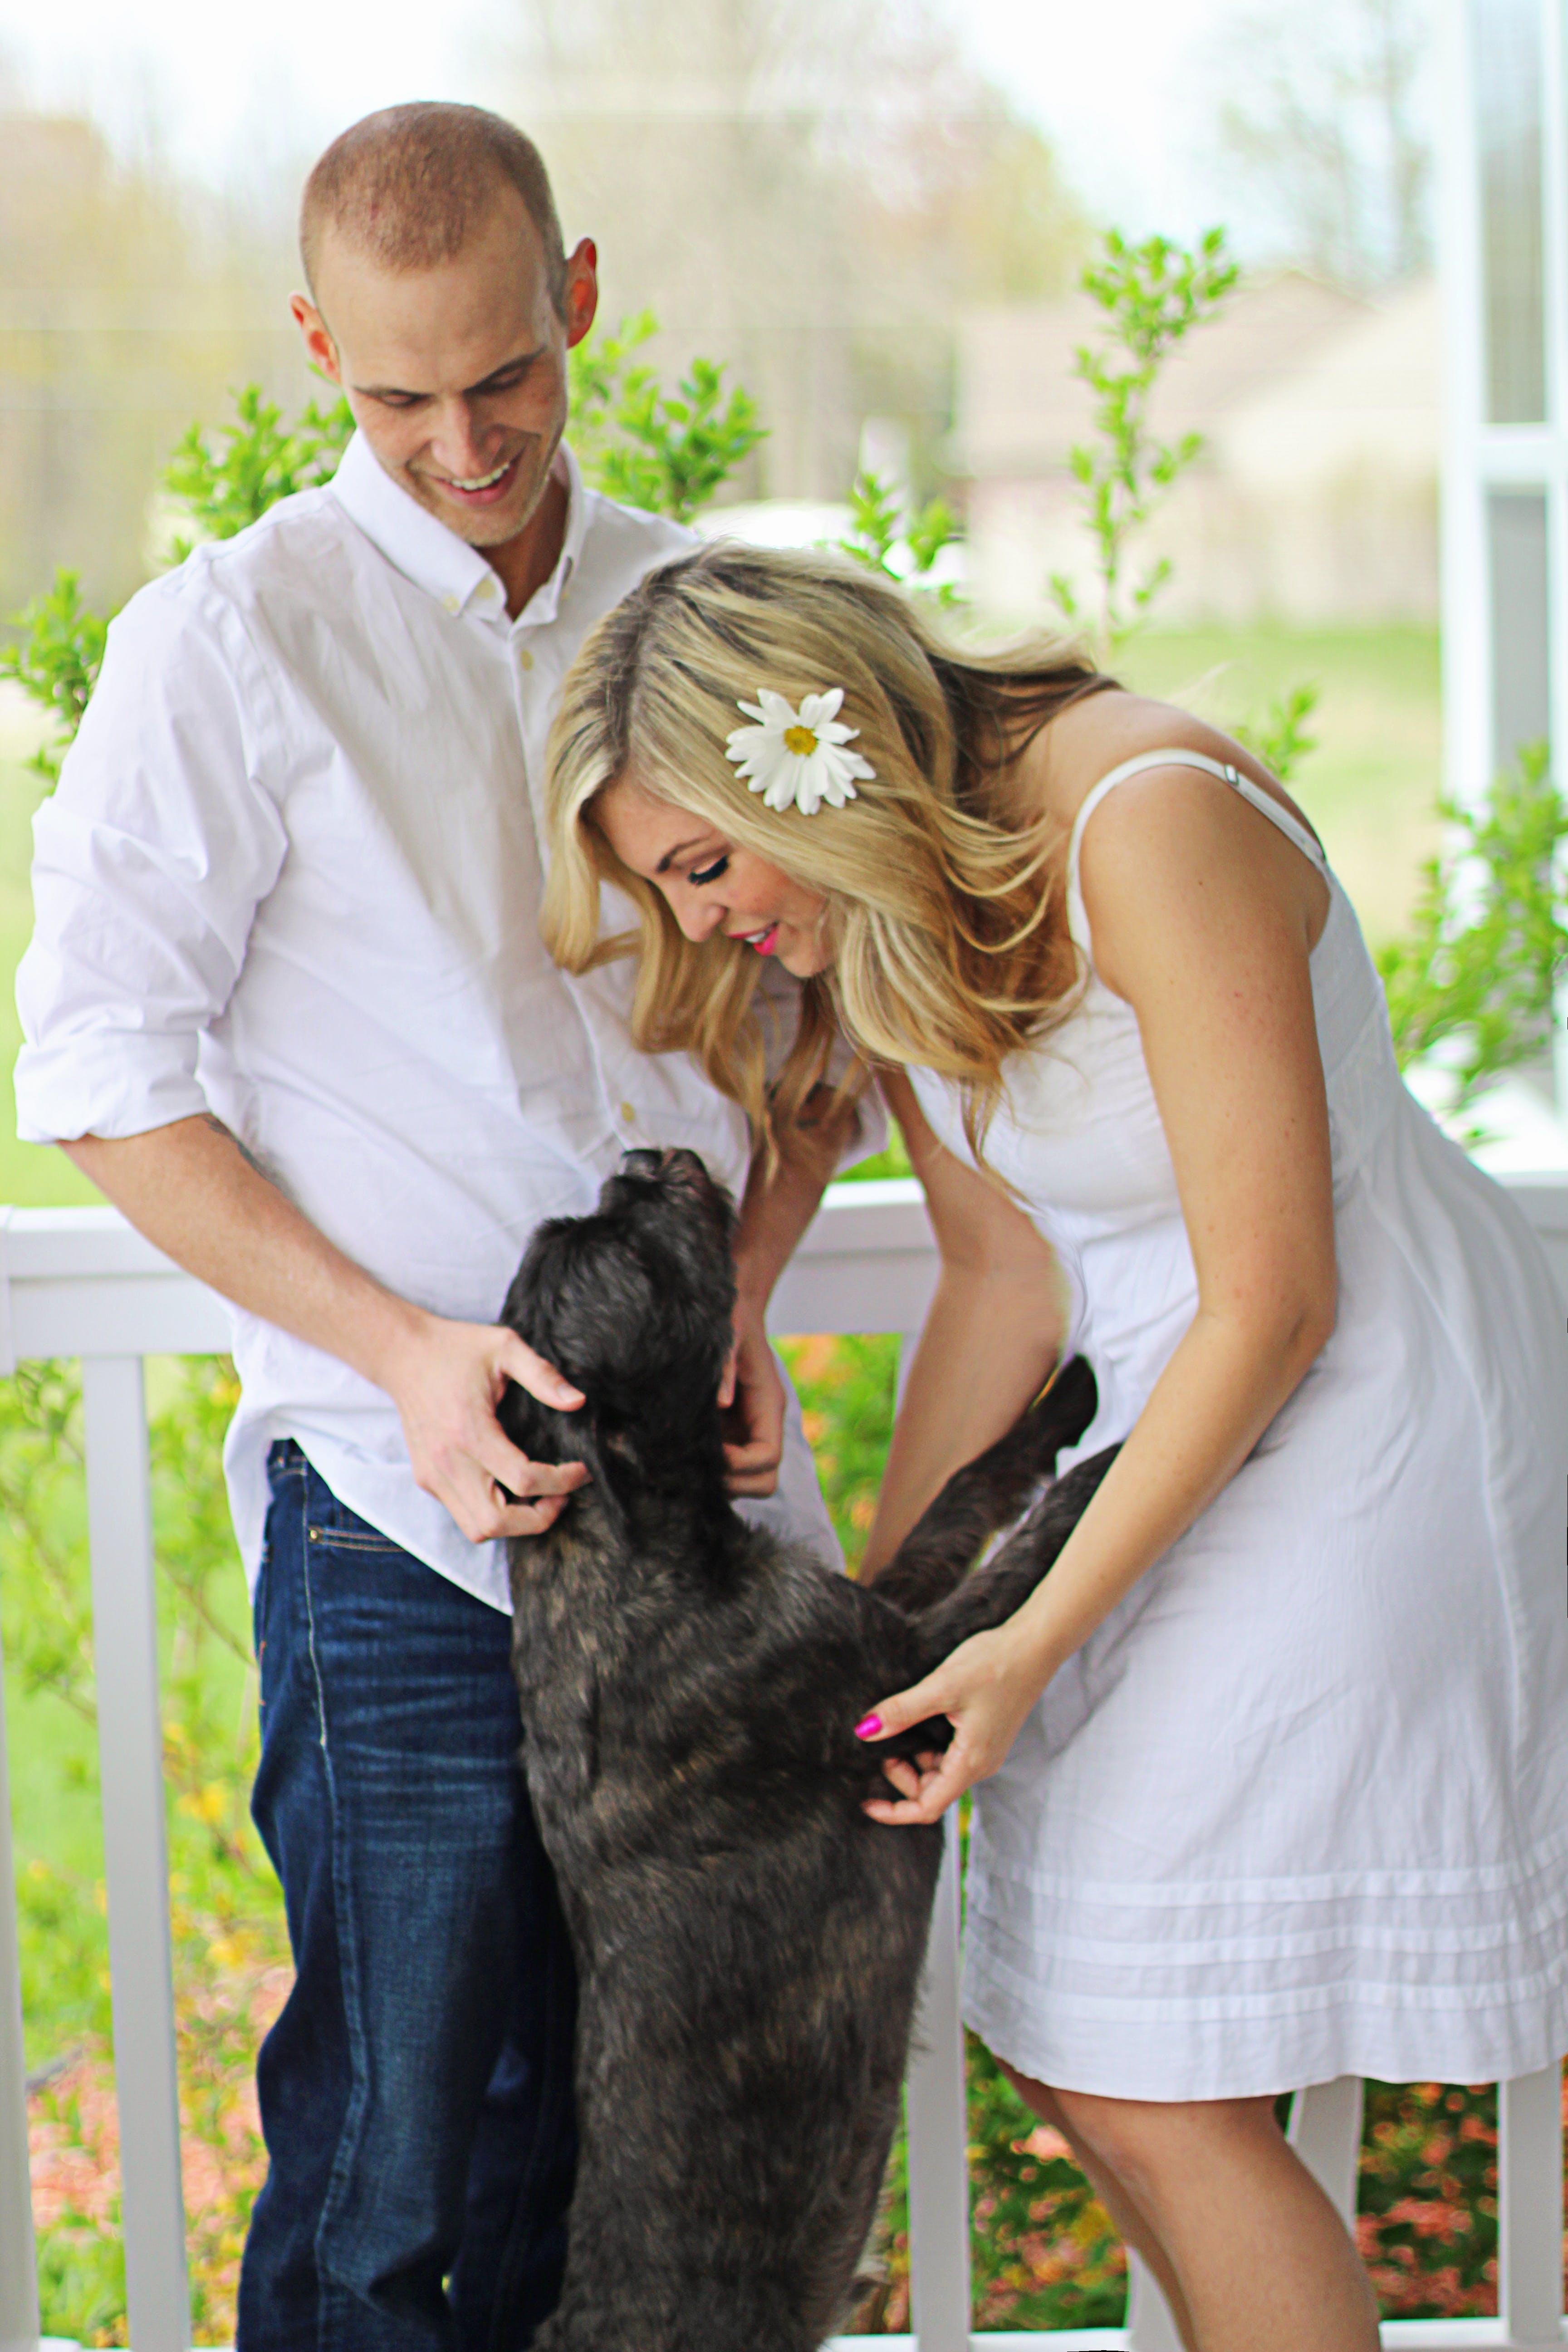 Free stock photo of love, people, summer, animal